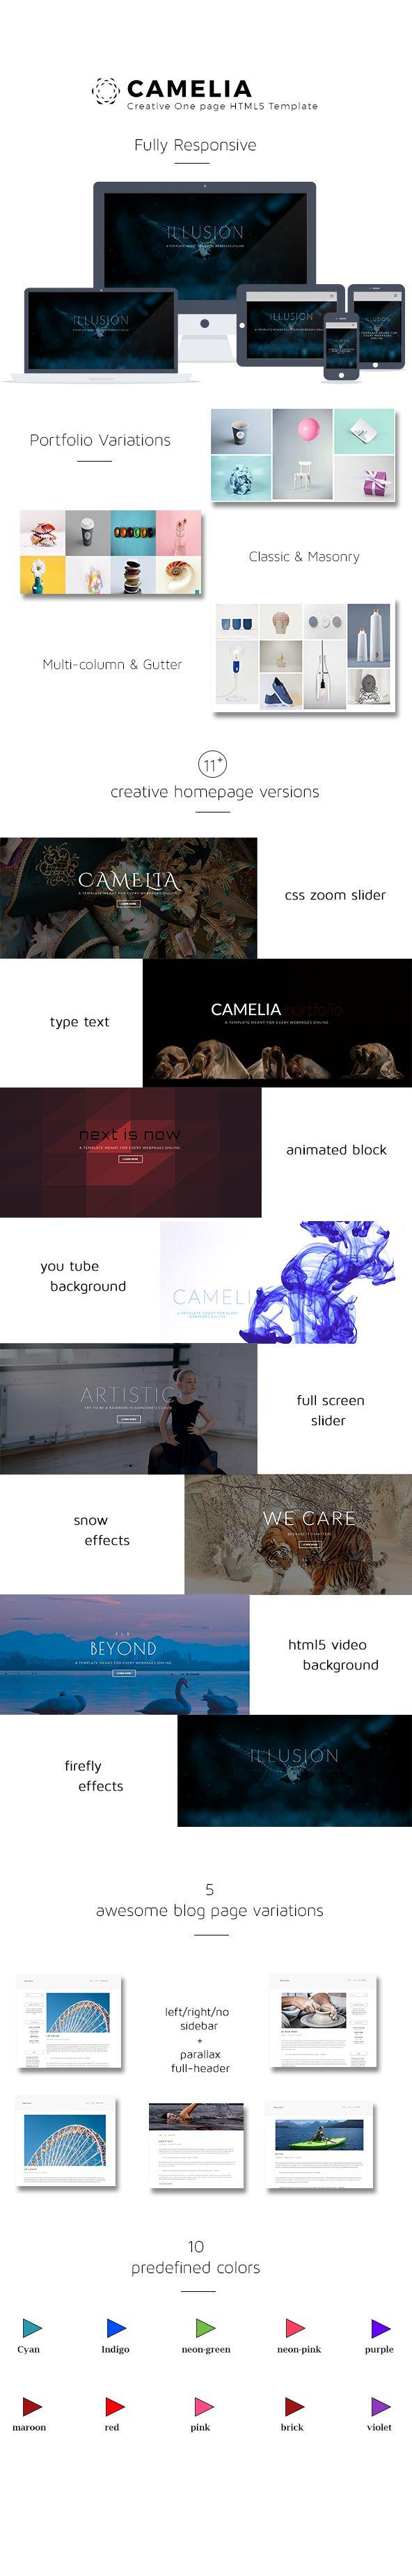 Camelia Responsive One Page Creative Template   Kreativ, Blog und ...